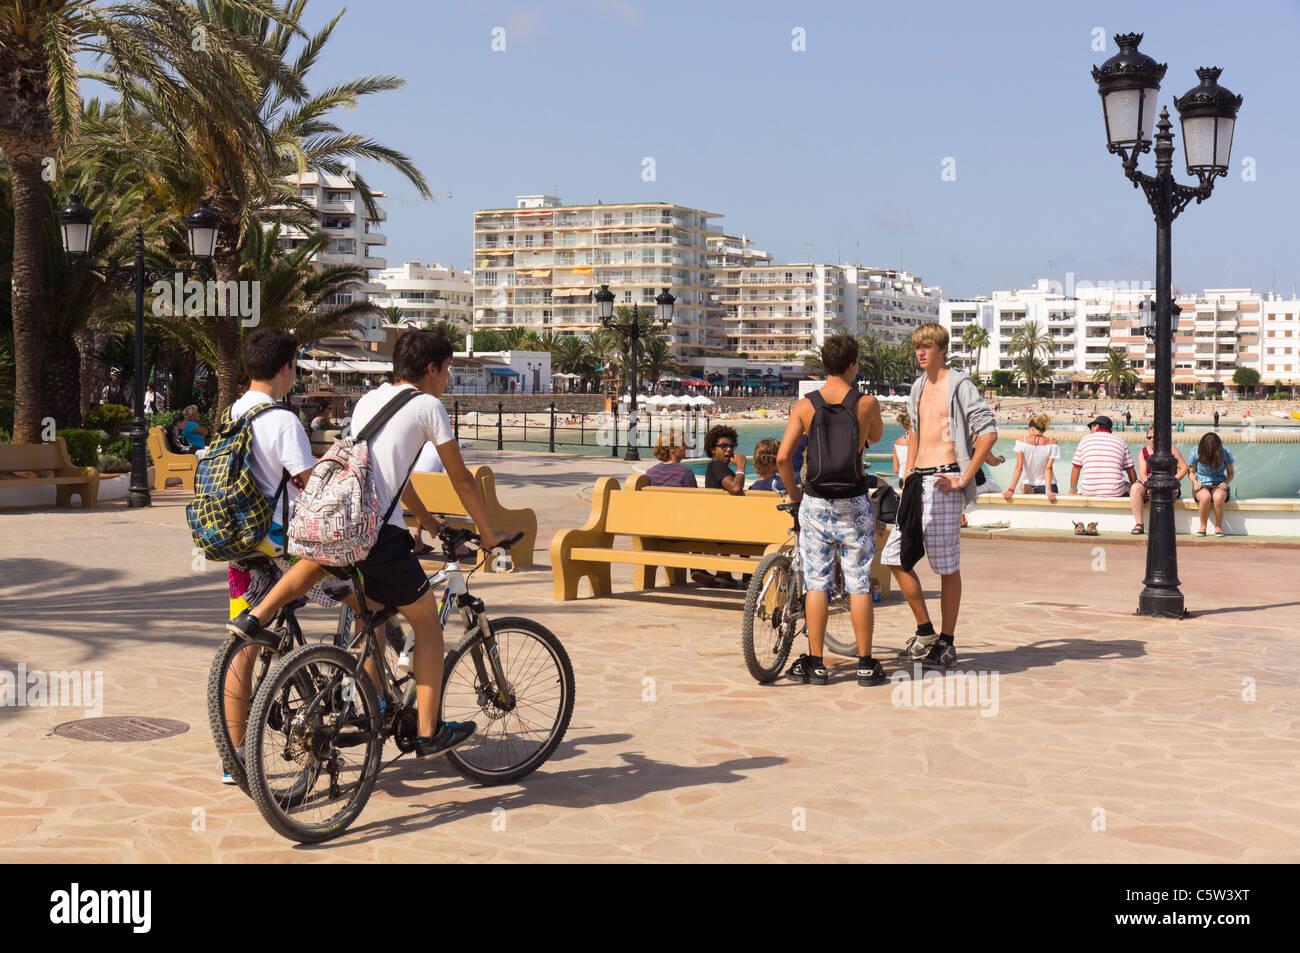 Ibiza, Balearics, Spain - Santa Eularia, beach resort on the east coast. Promenade with cyclists. - Stock Image